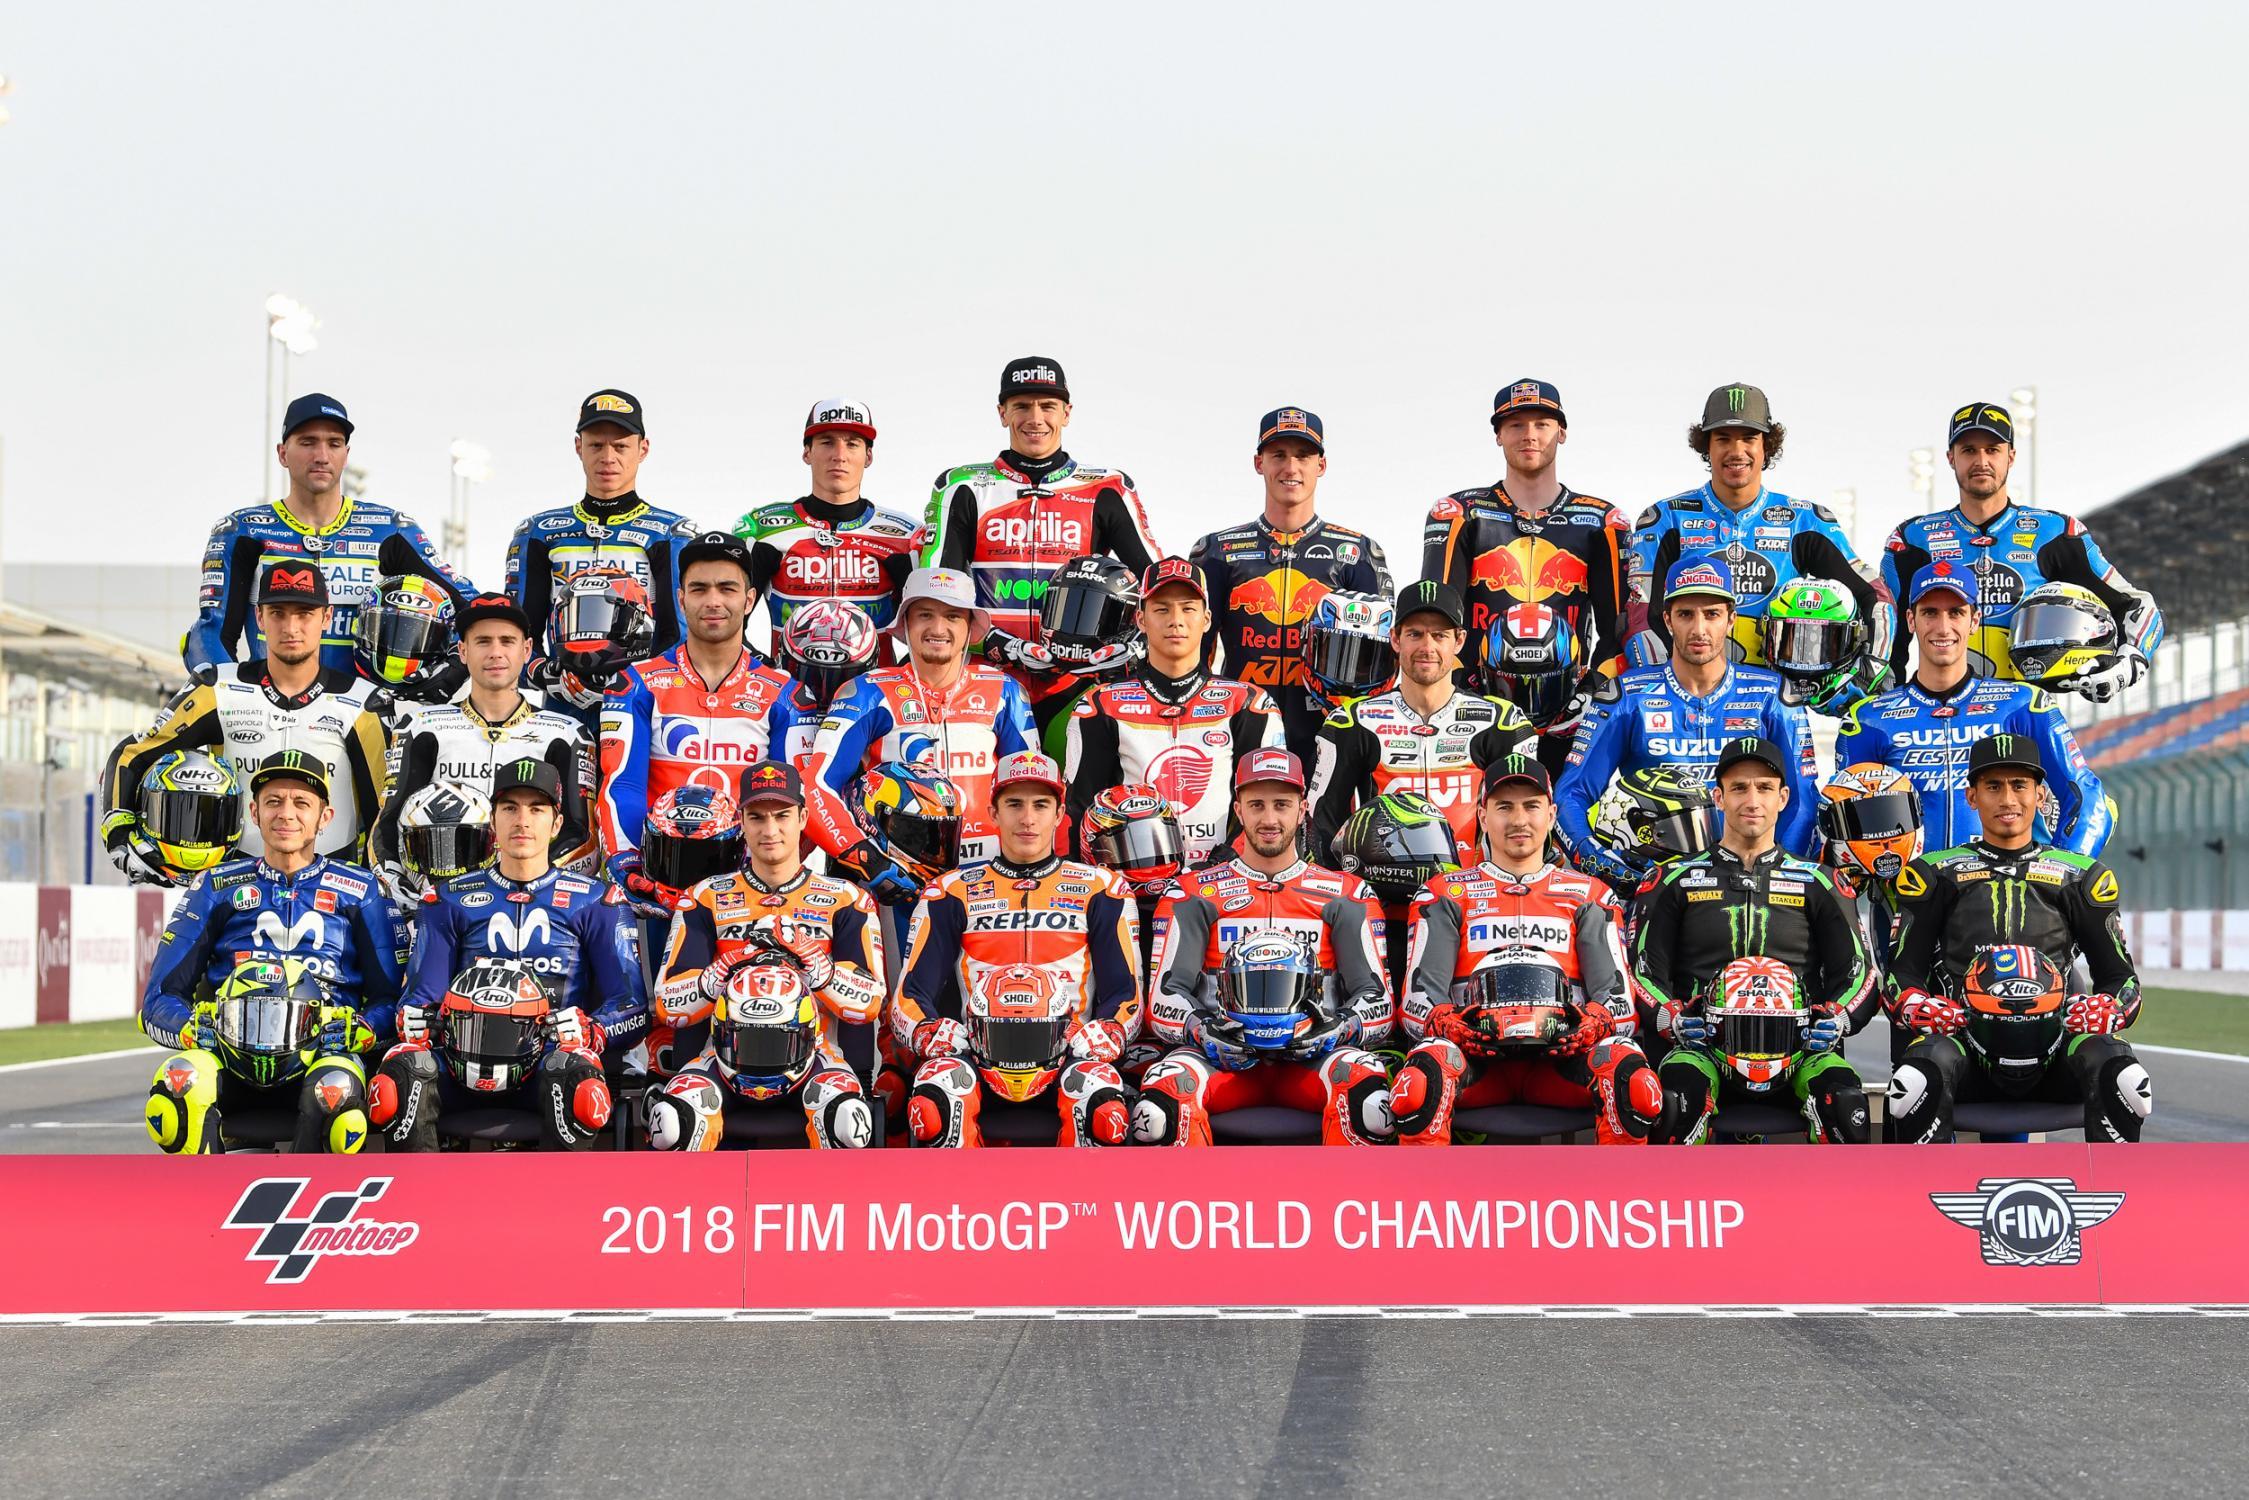 moto gp japan 2019